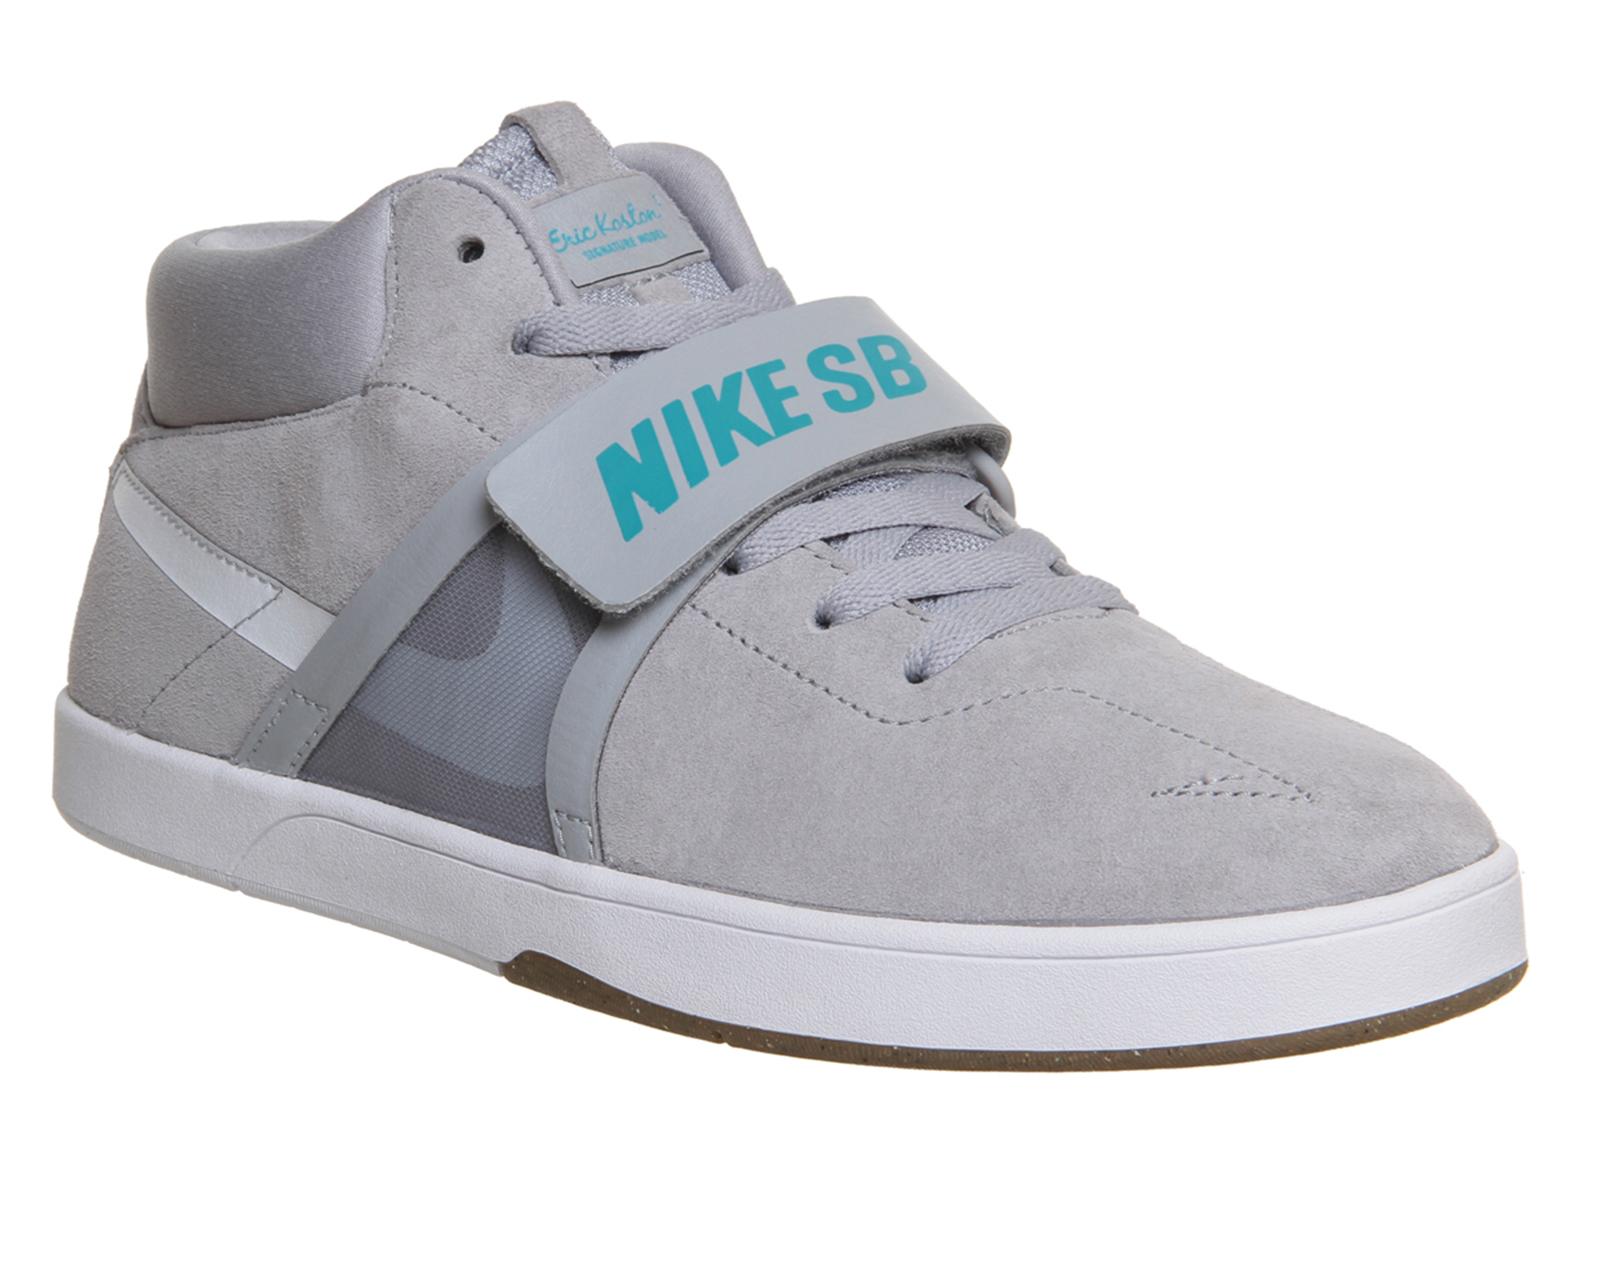 Nike Sb Eric Koston Mid Prem in Grey (Gray) for Men - Lyst